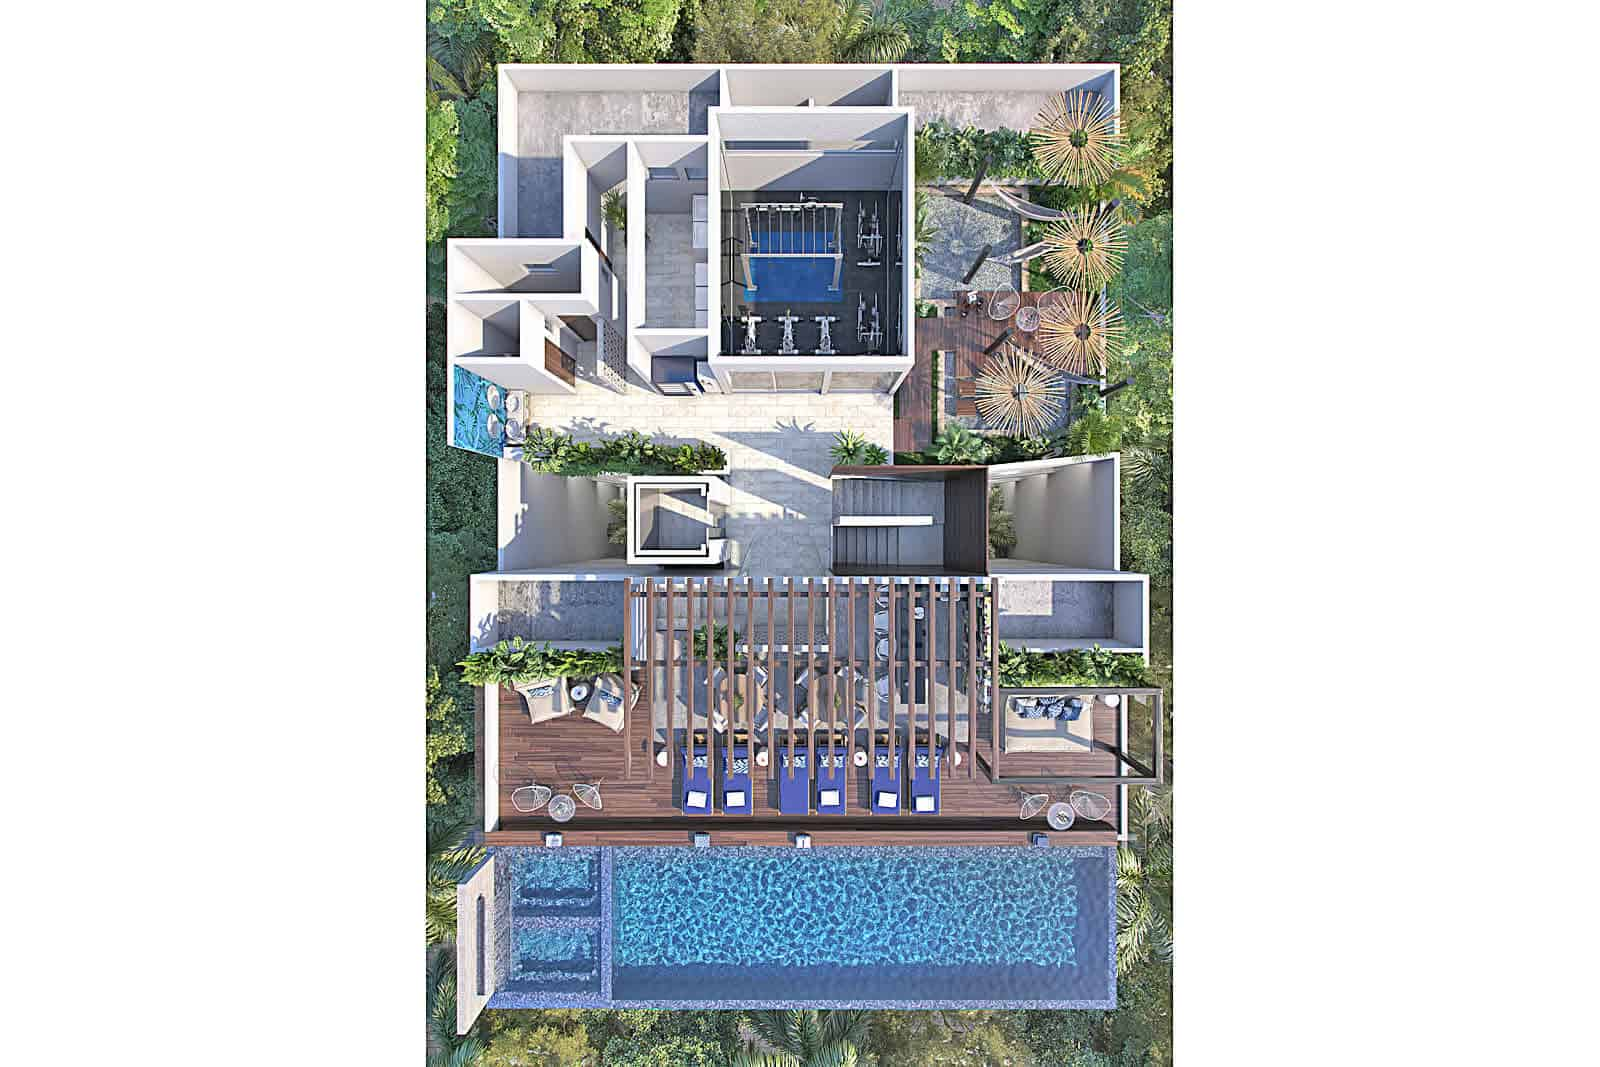 Piedrazul rooftop pool & lounge